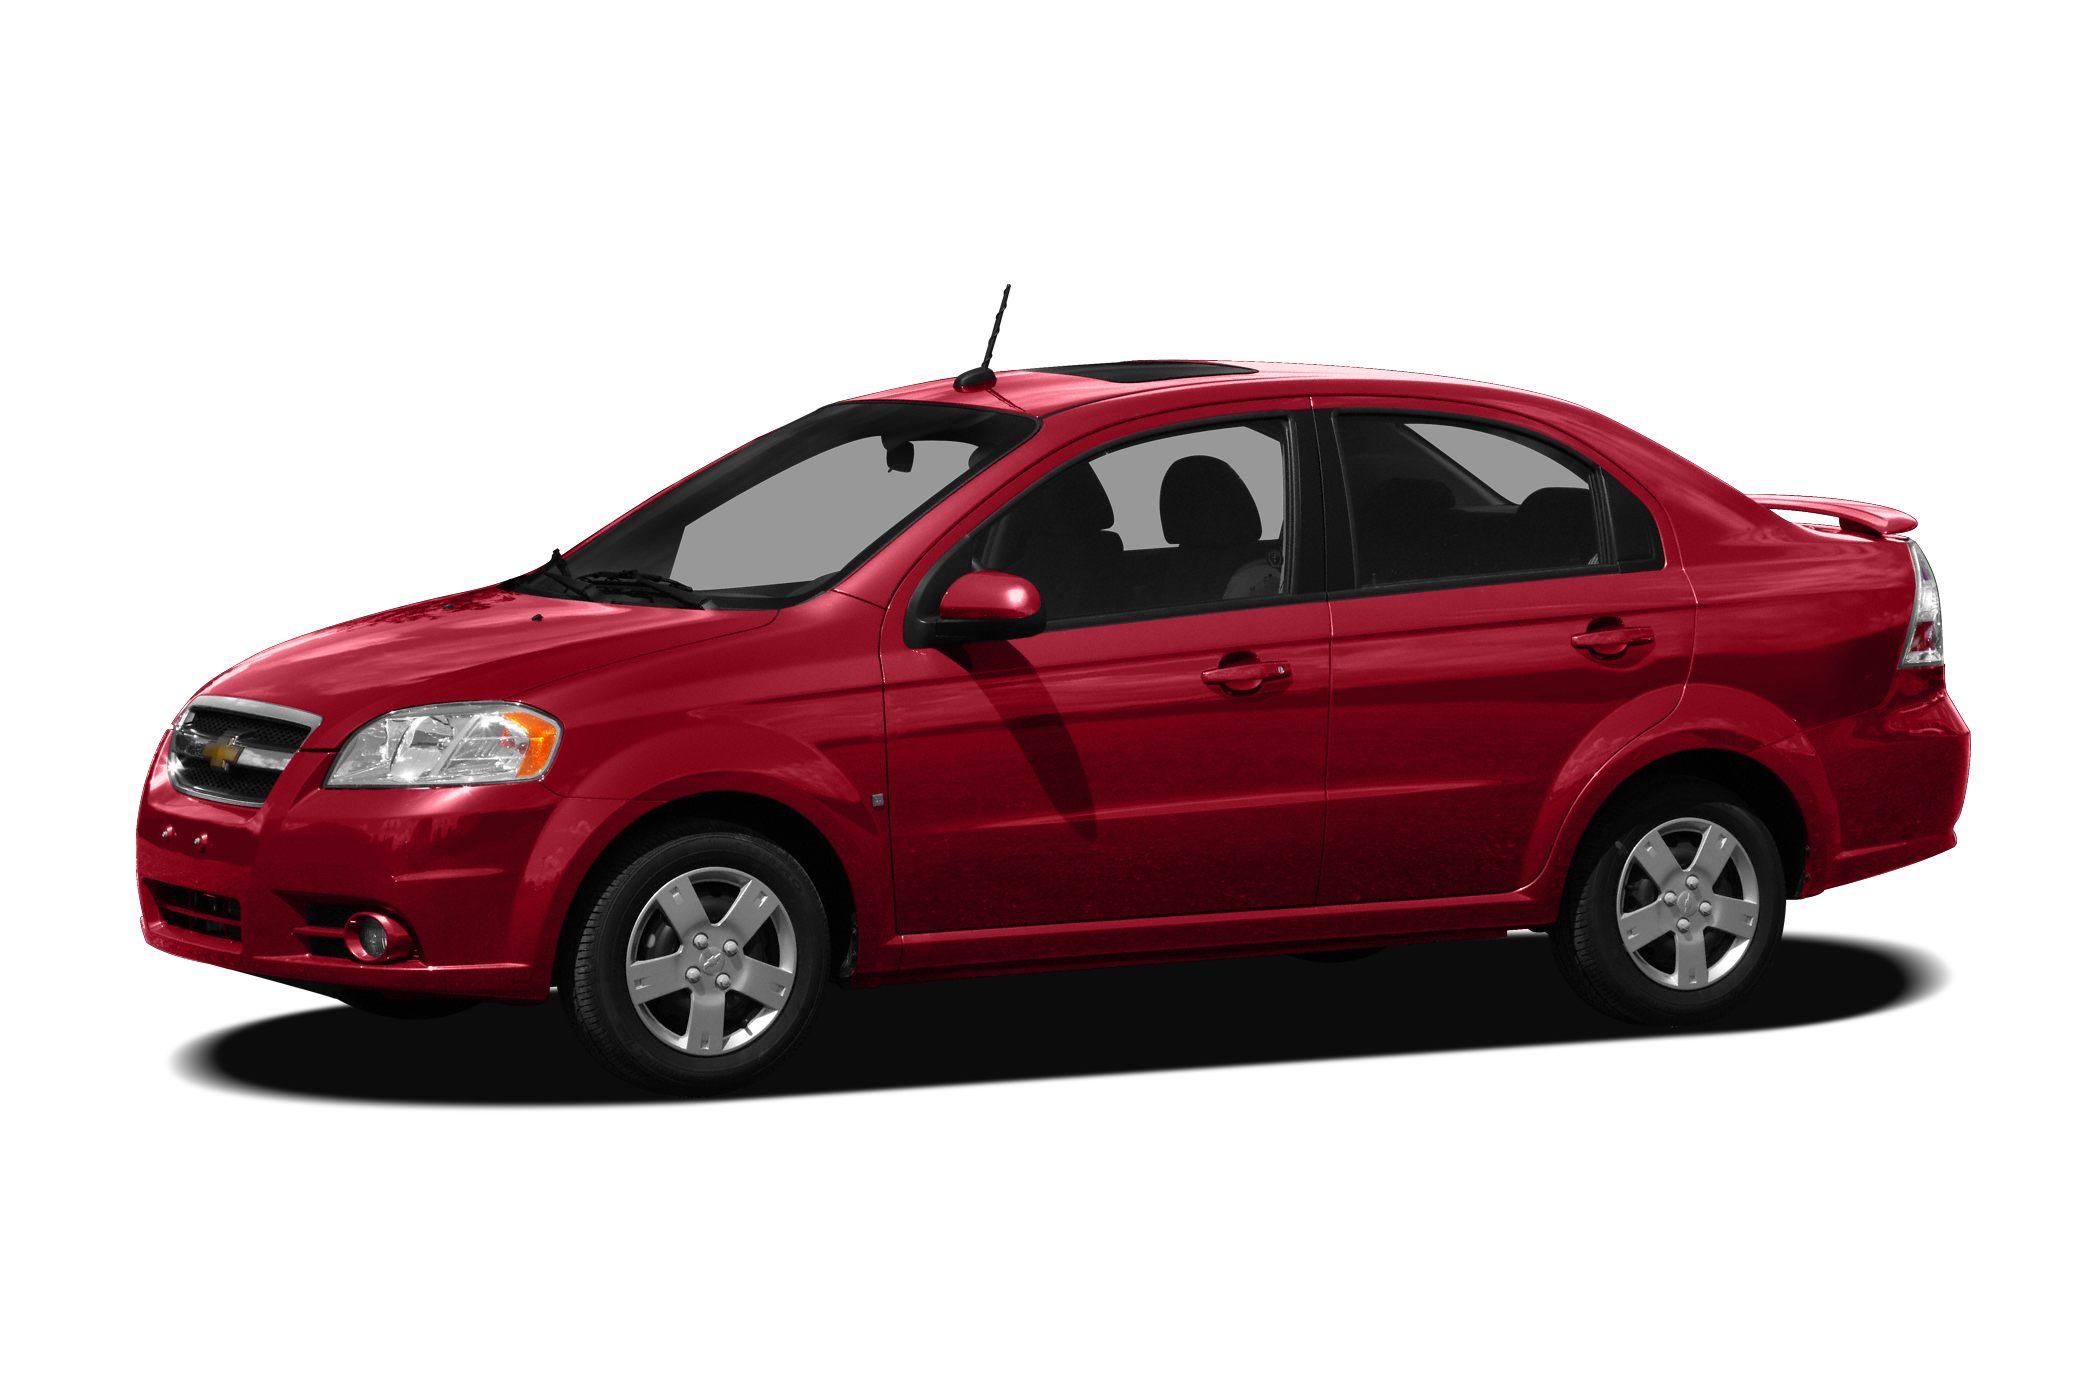 CAC10CHC161B0101 - 2011 Chevrolet Aveo Ls